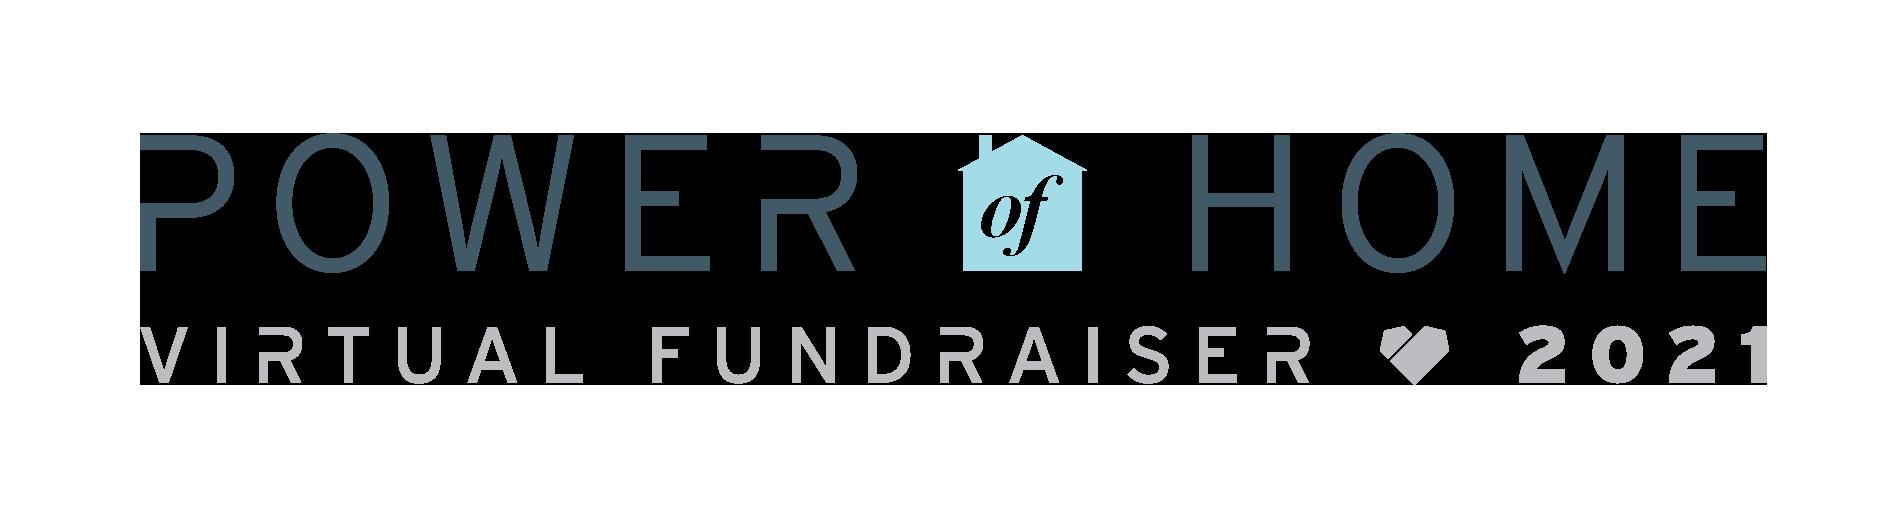 Power of Home Virtual Fundraiser 2021